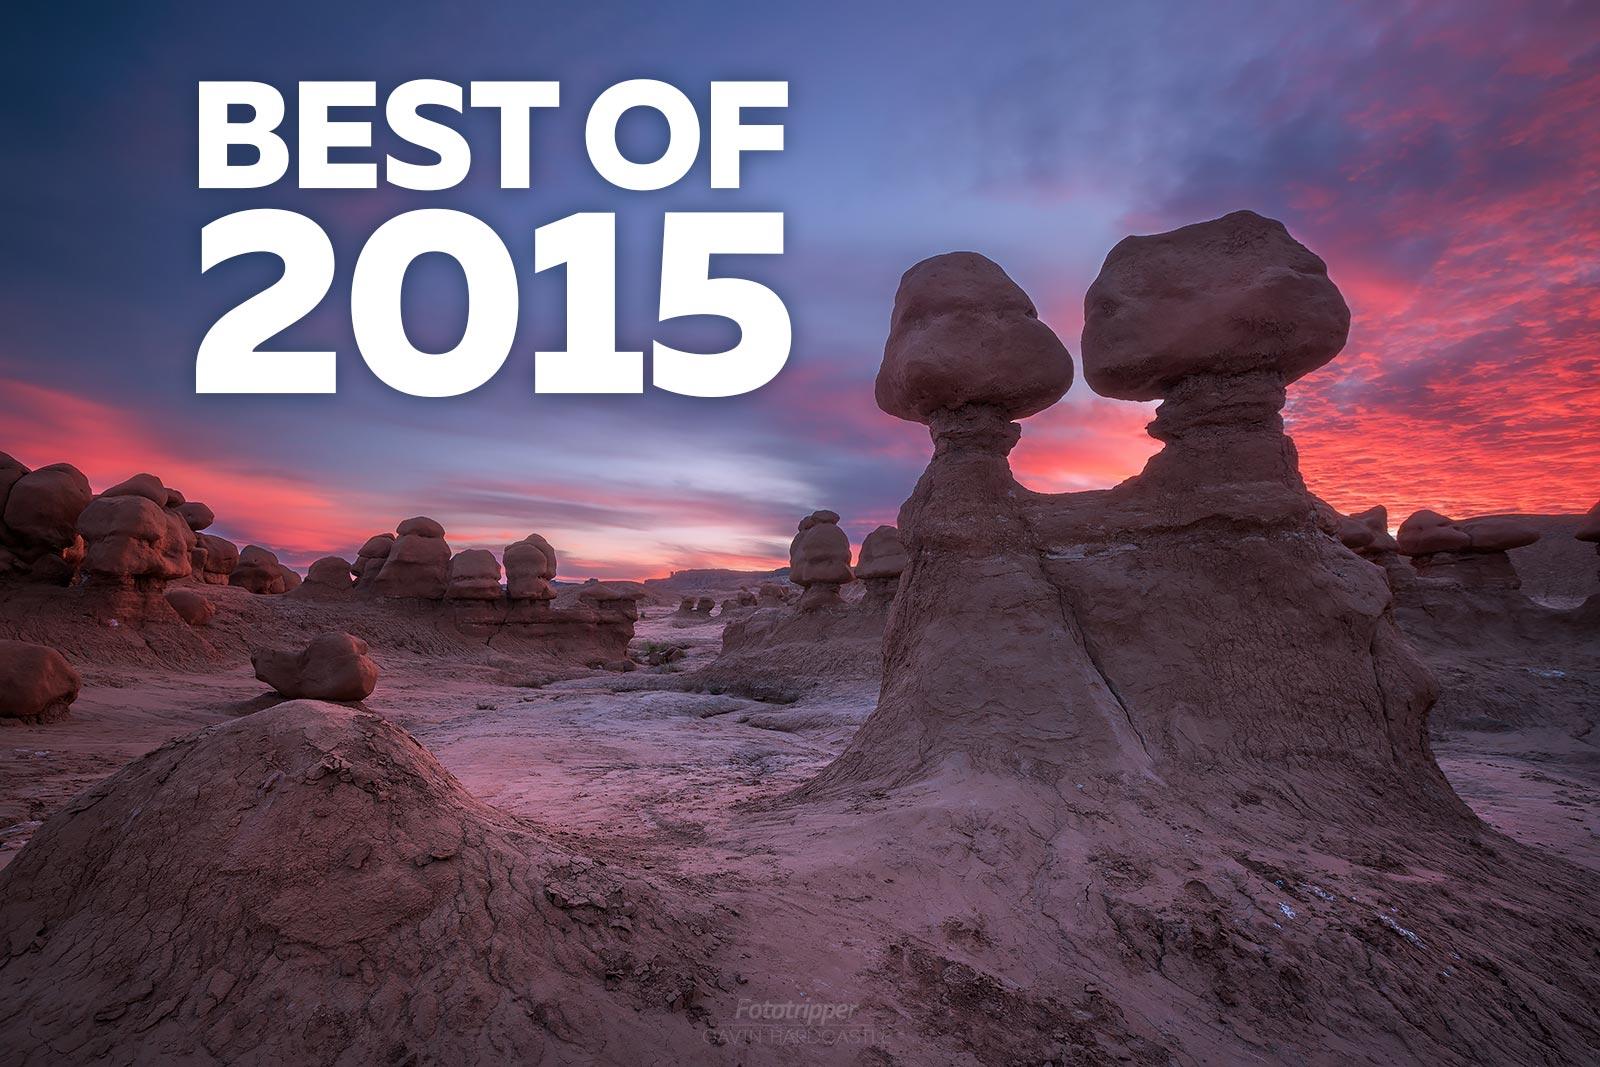 Best Landscape Photography Images of 2015